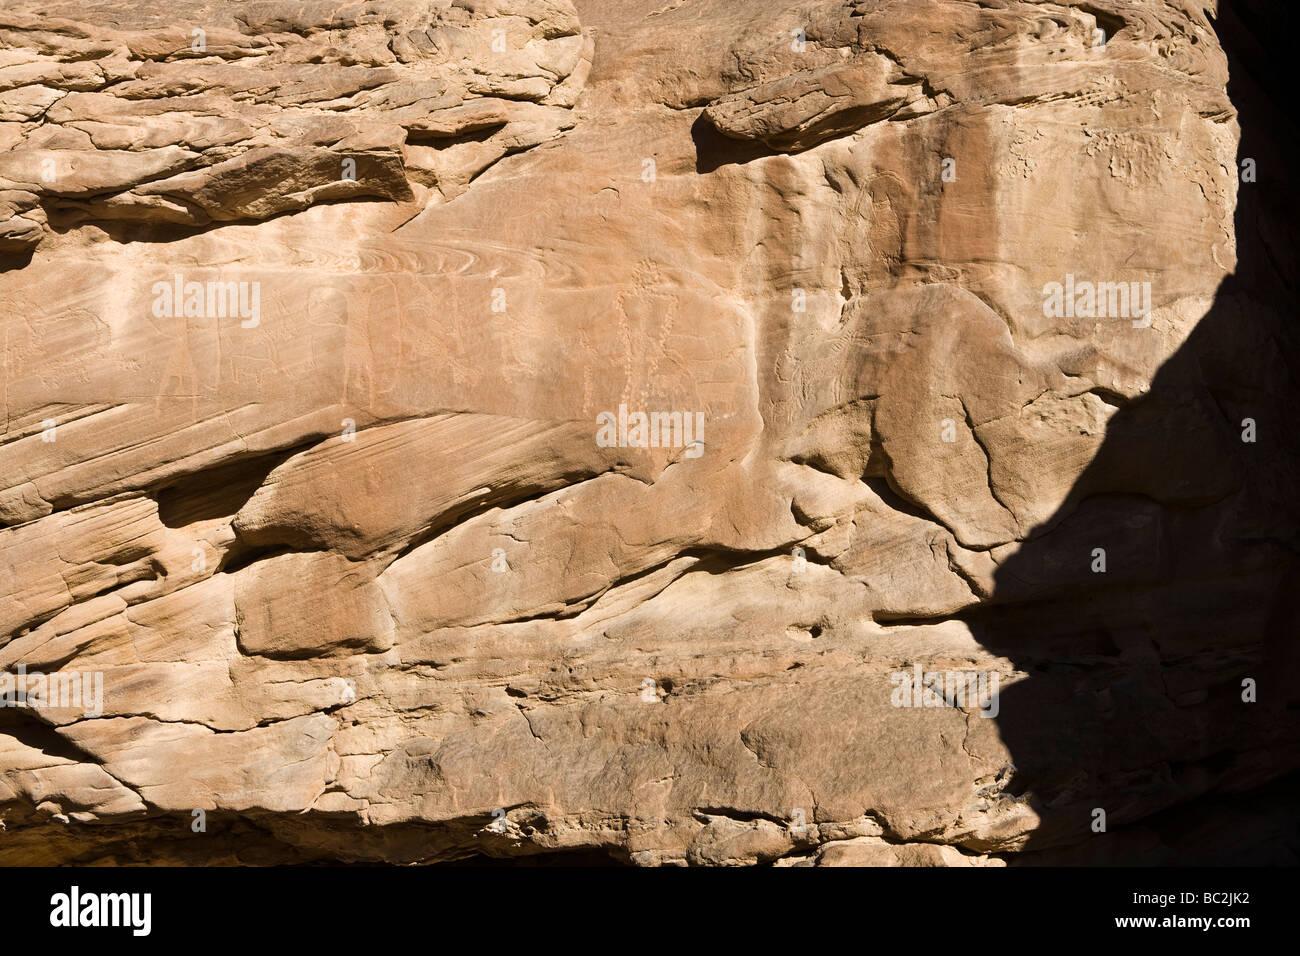 Rock-art in the Eastern Desert of Egypt, North Africa - Stock Image